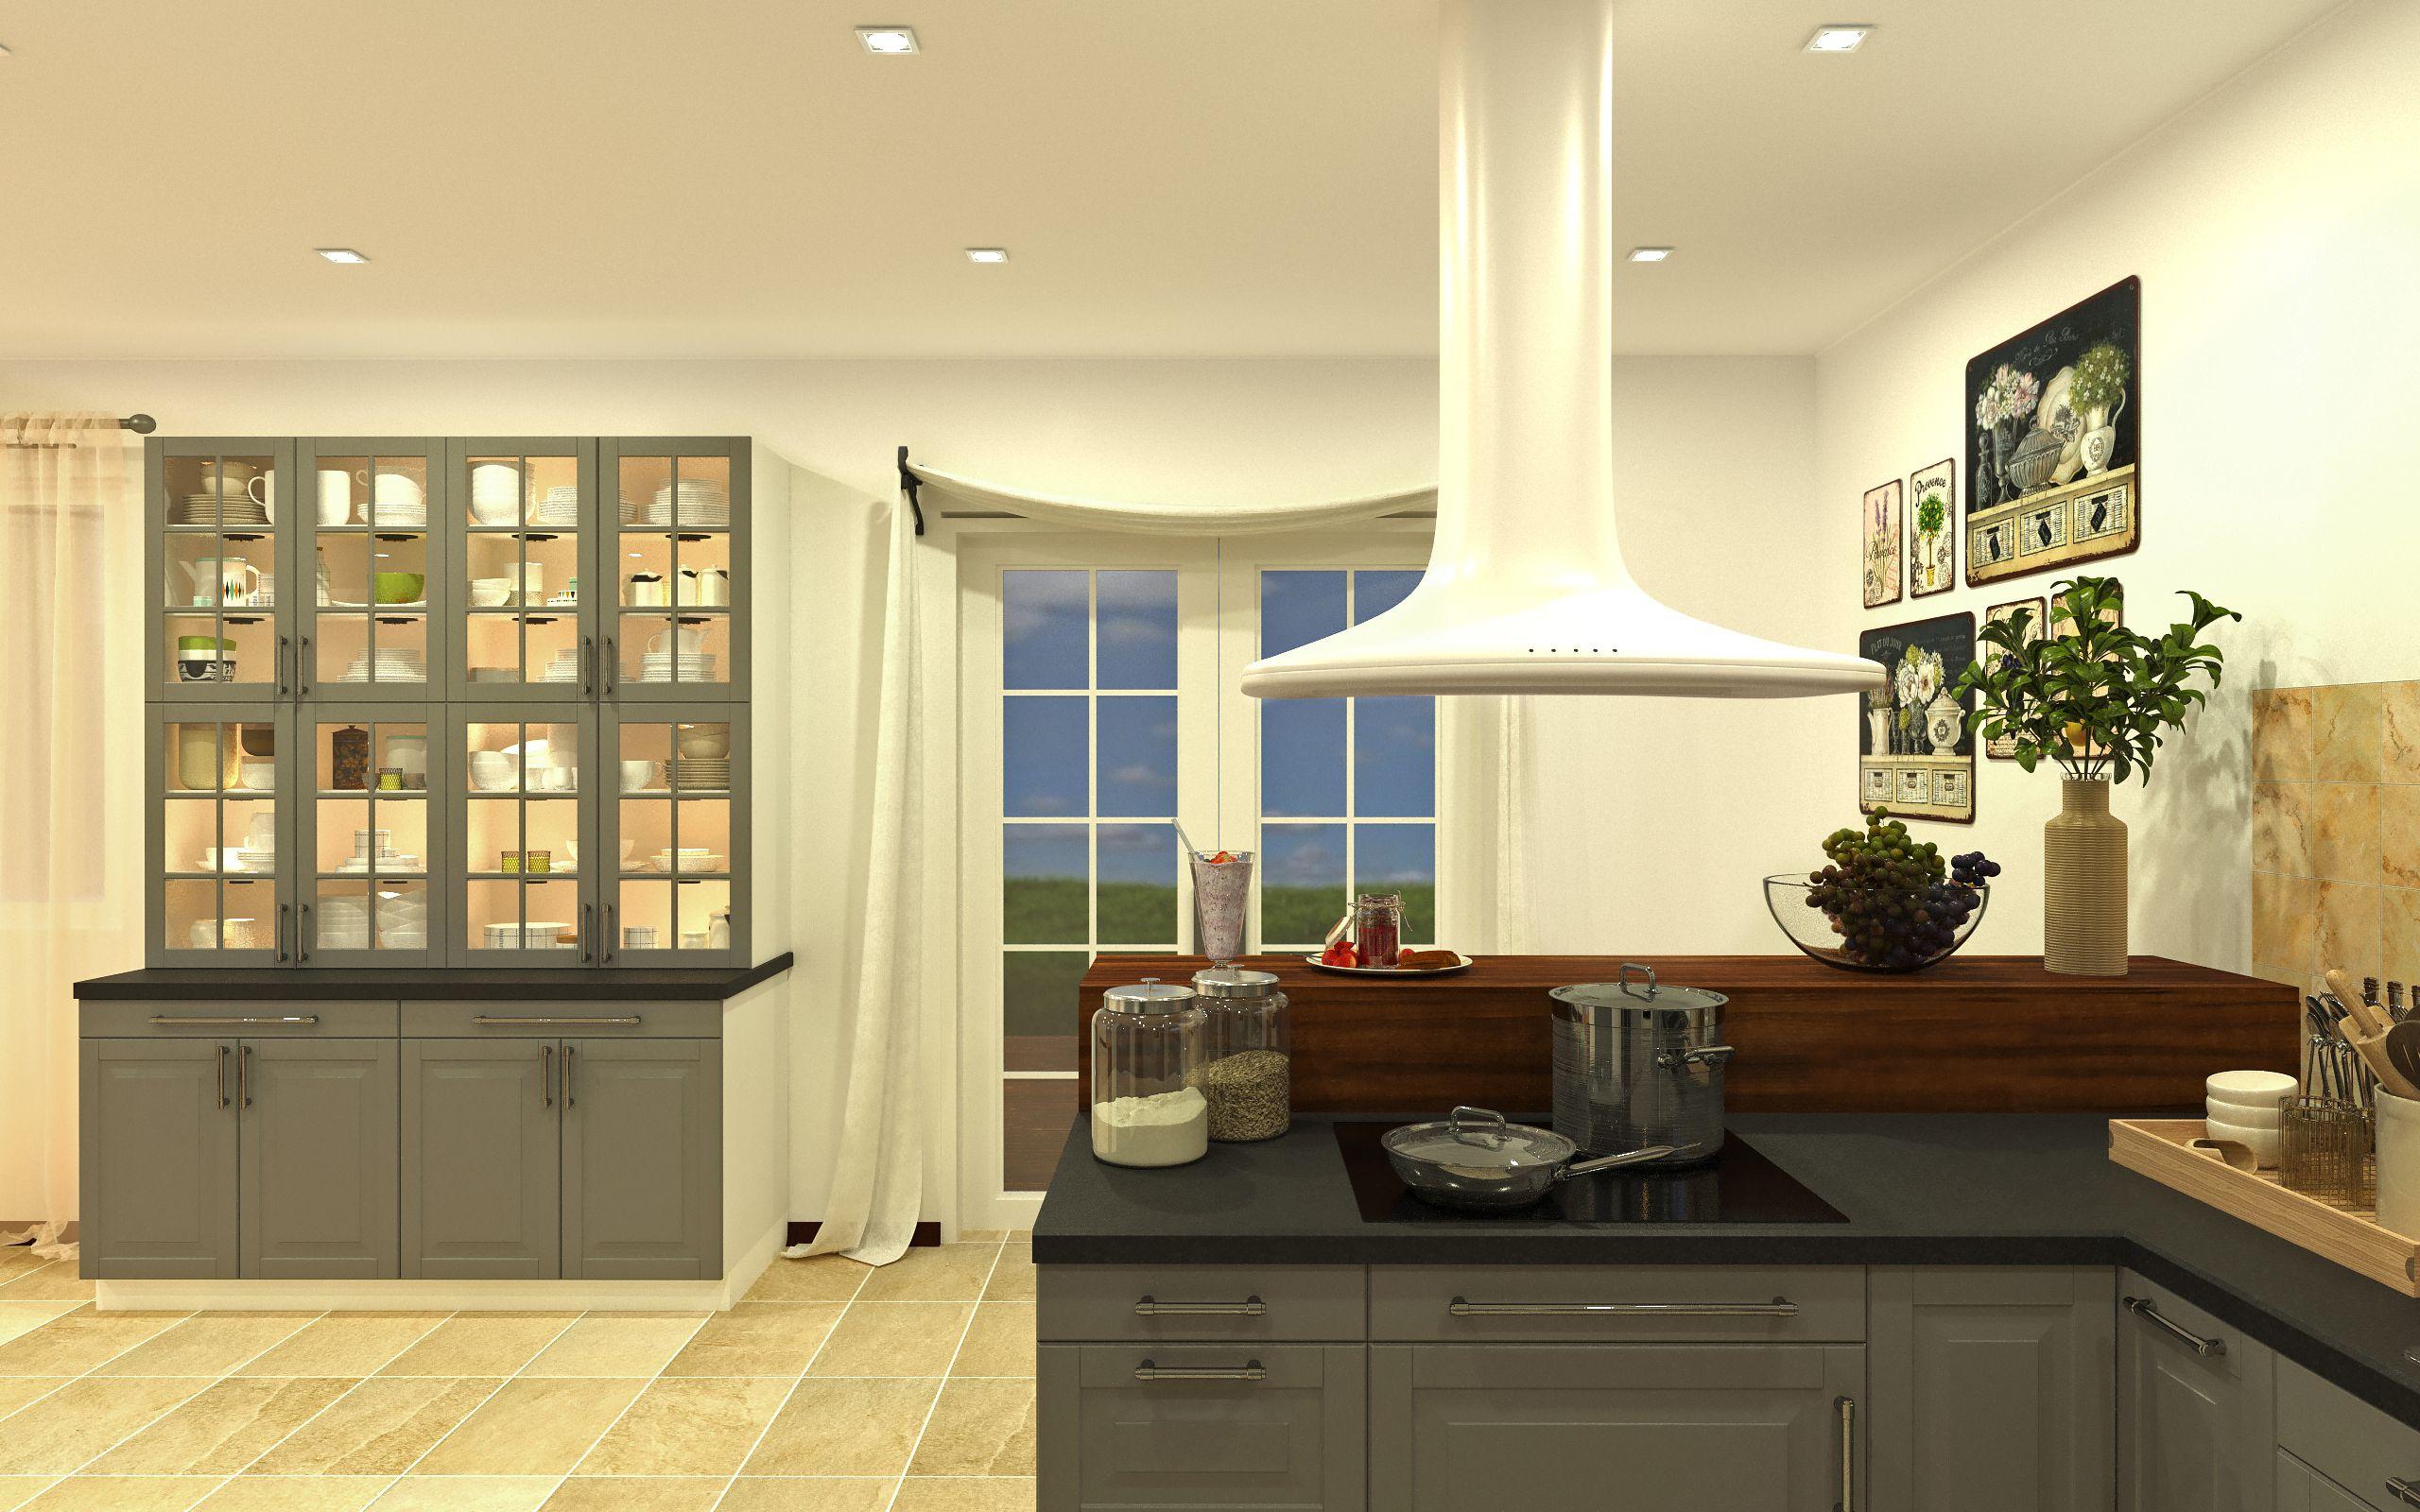 Kitchen Design, 3ds Max, Corona Renderer, IKEA